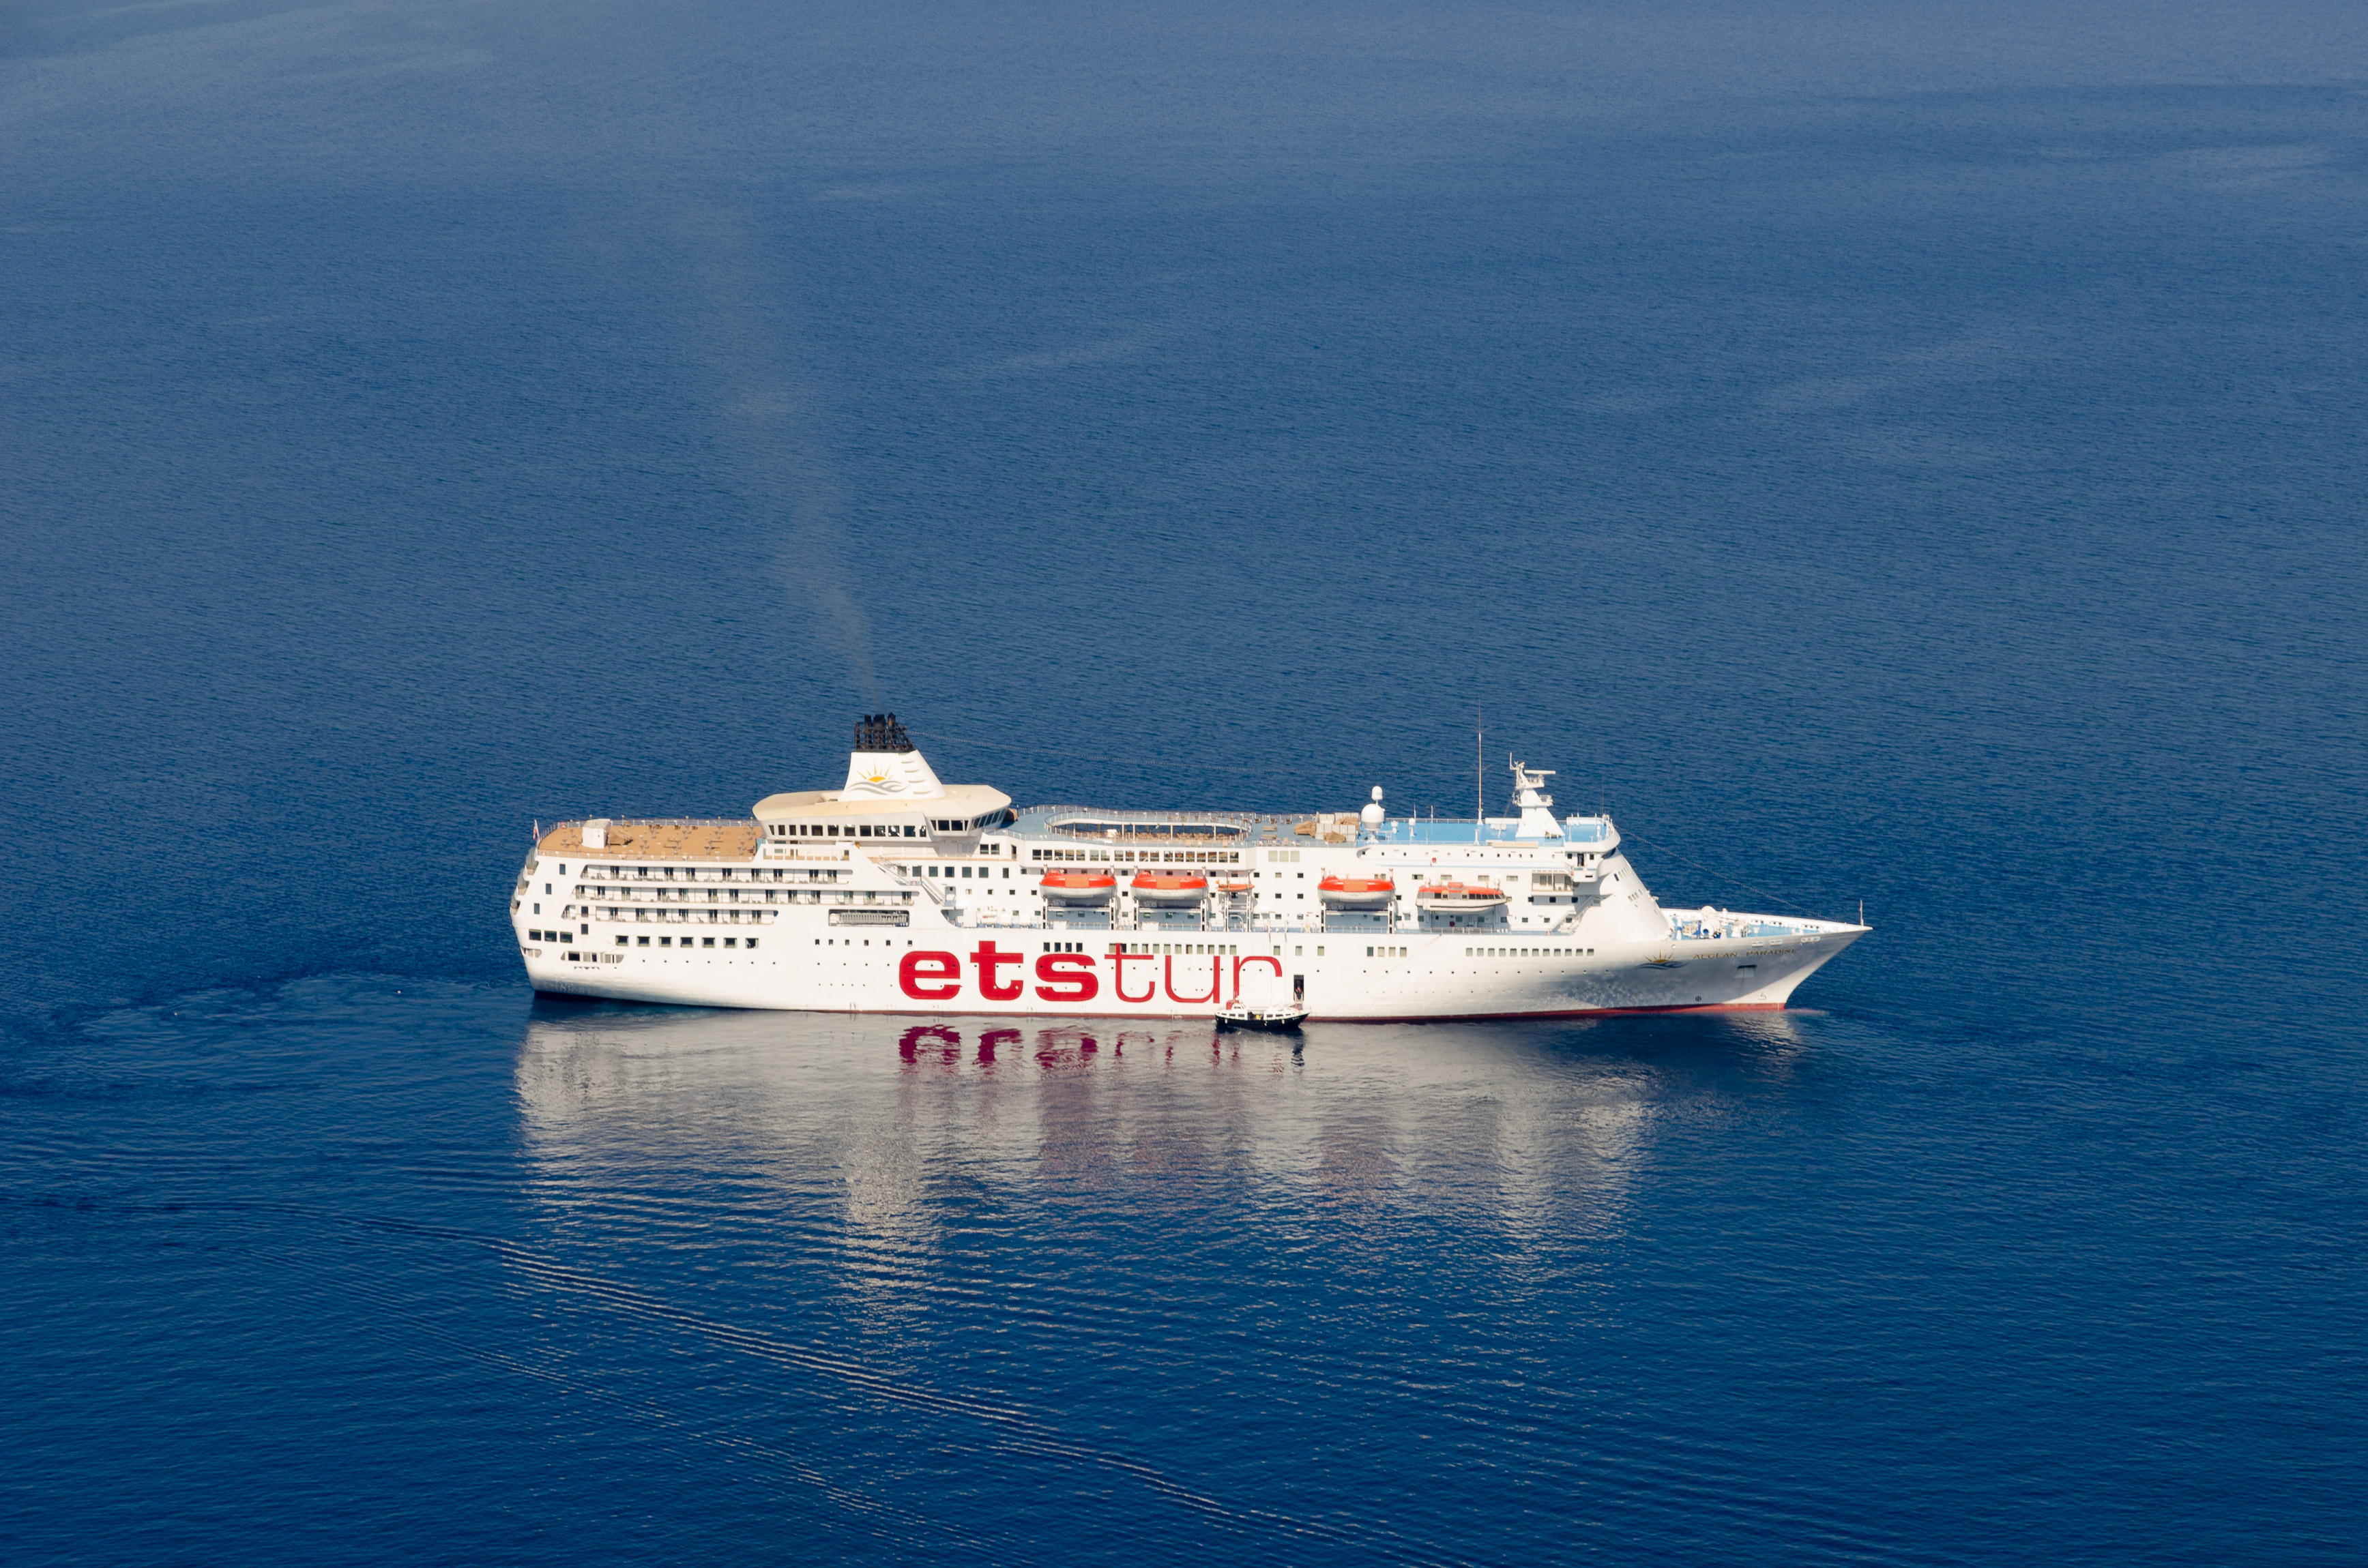 FileEstur Cruise Ship  Caldera  Santorini  Greecejpg